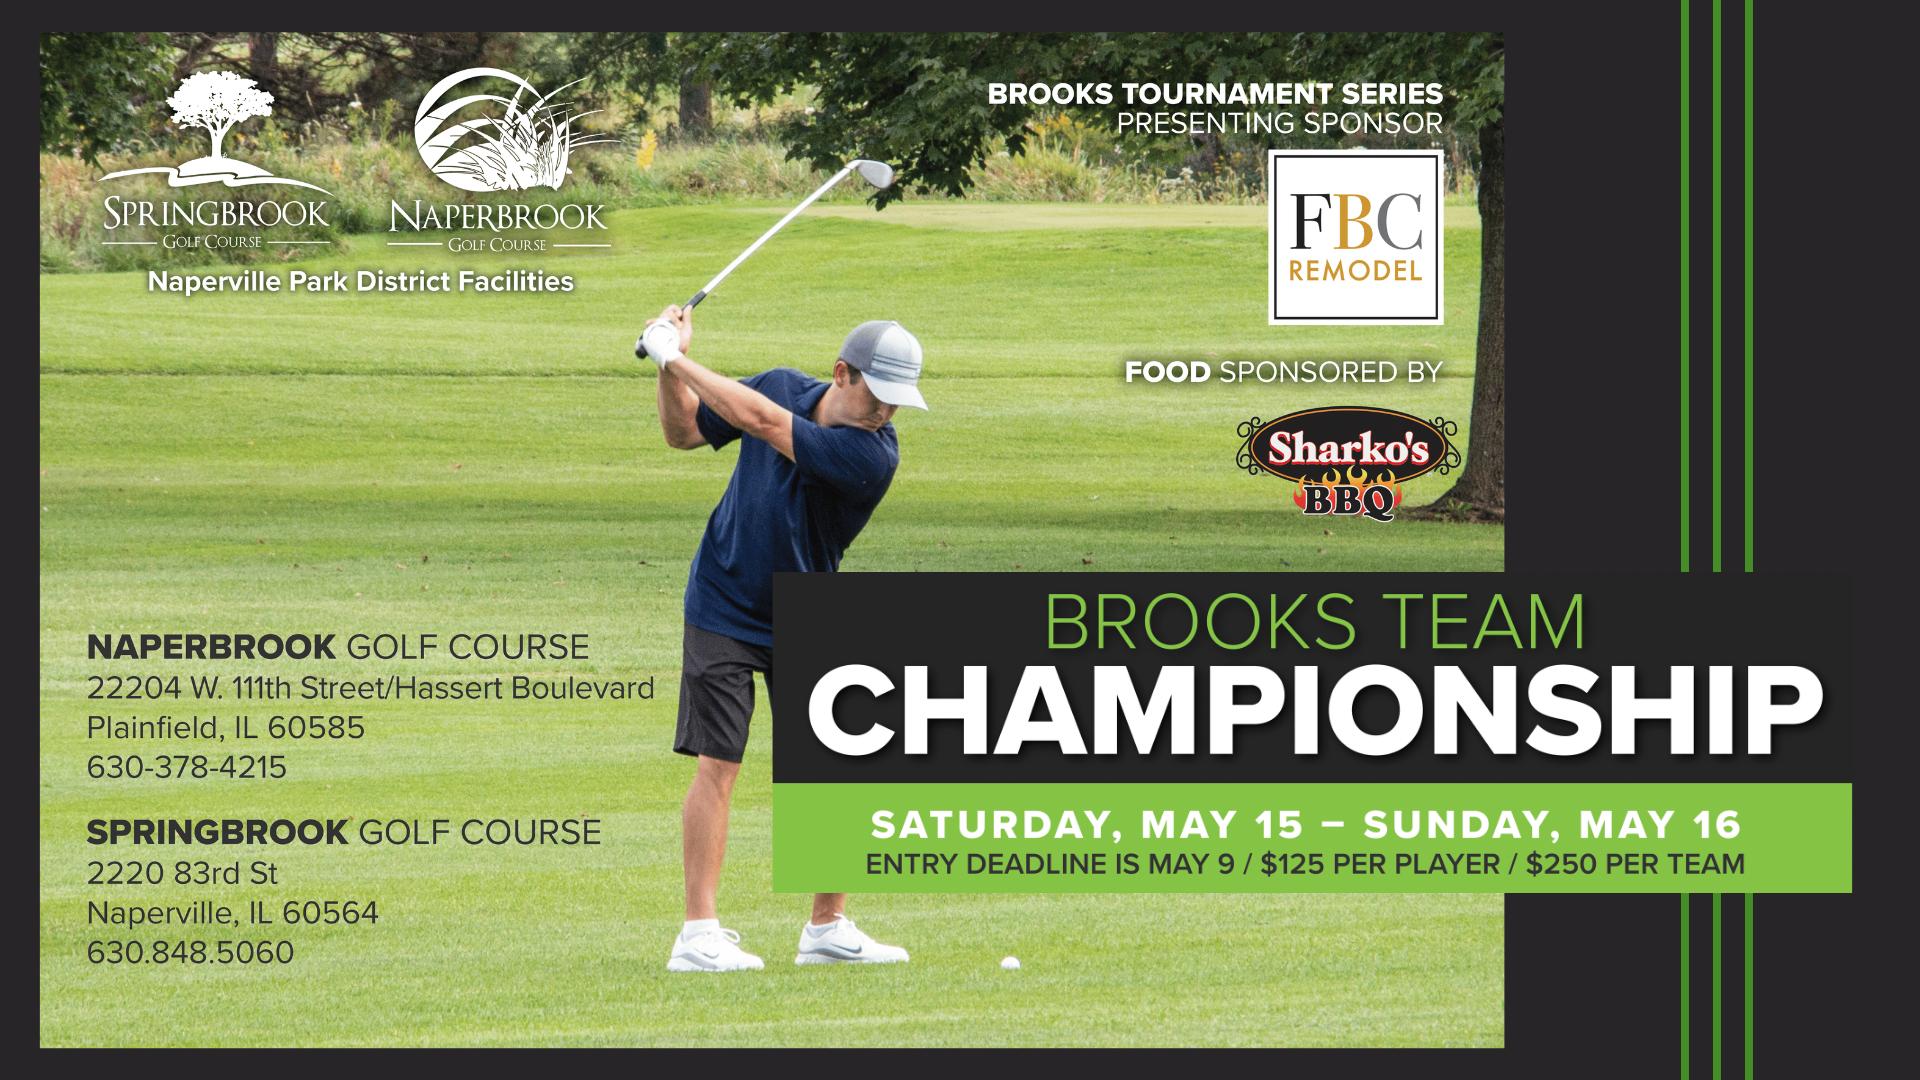 Brooks Team Championship at Springbrook & Naperbook